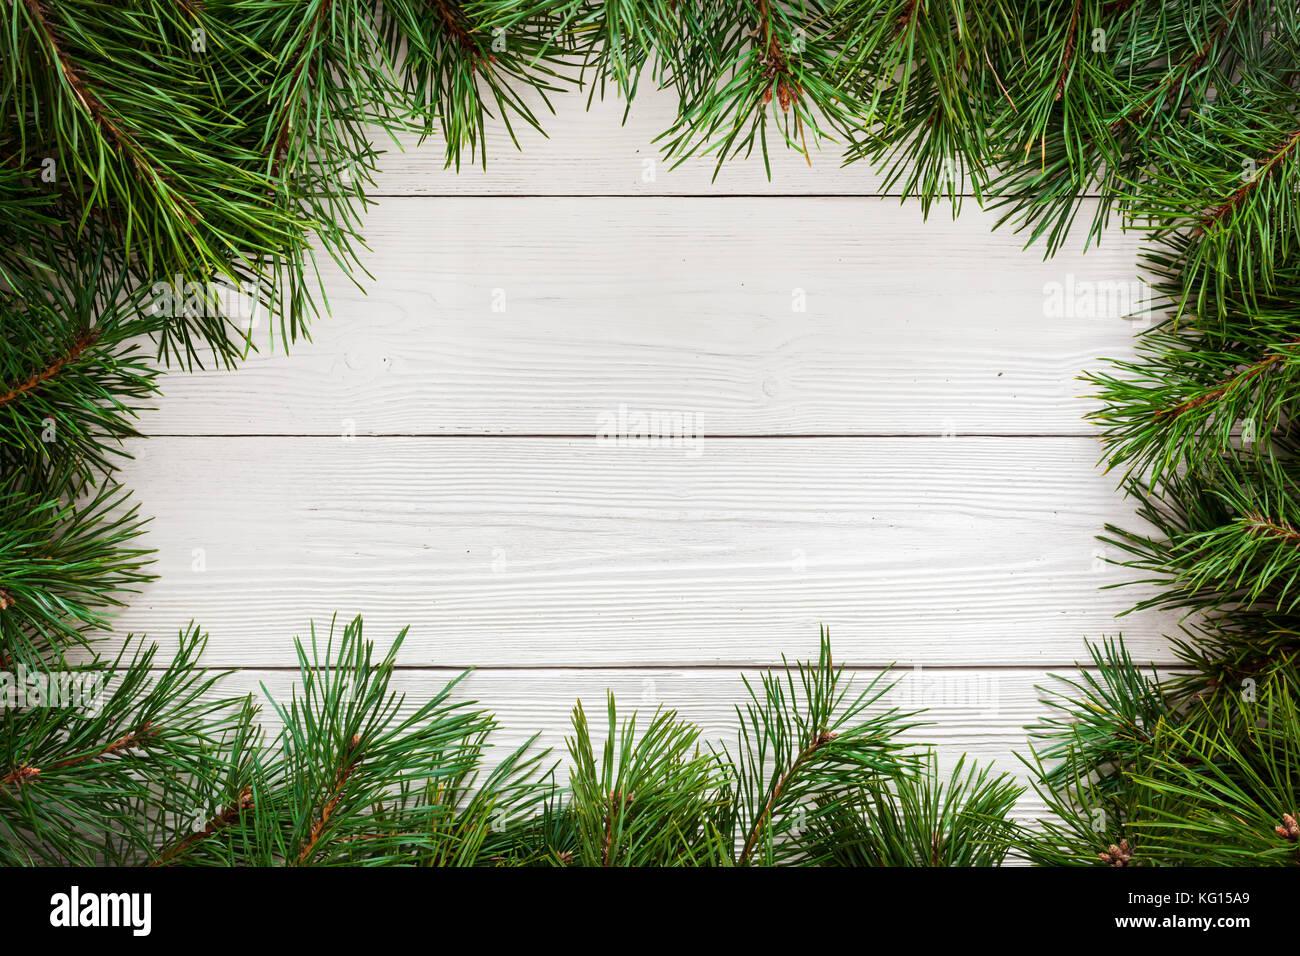 Template for christmas card - Stock Image